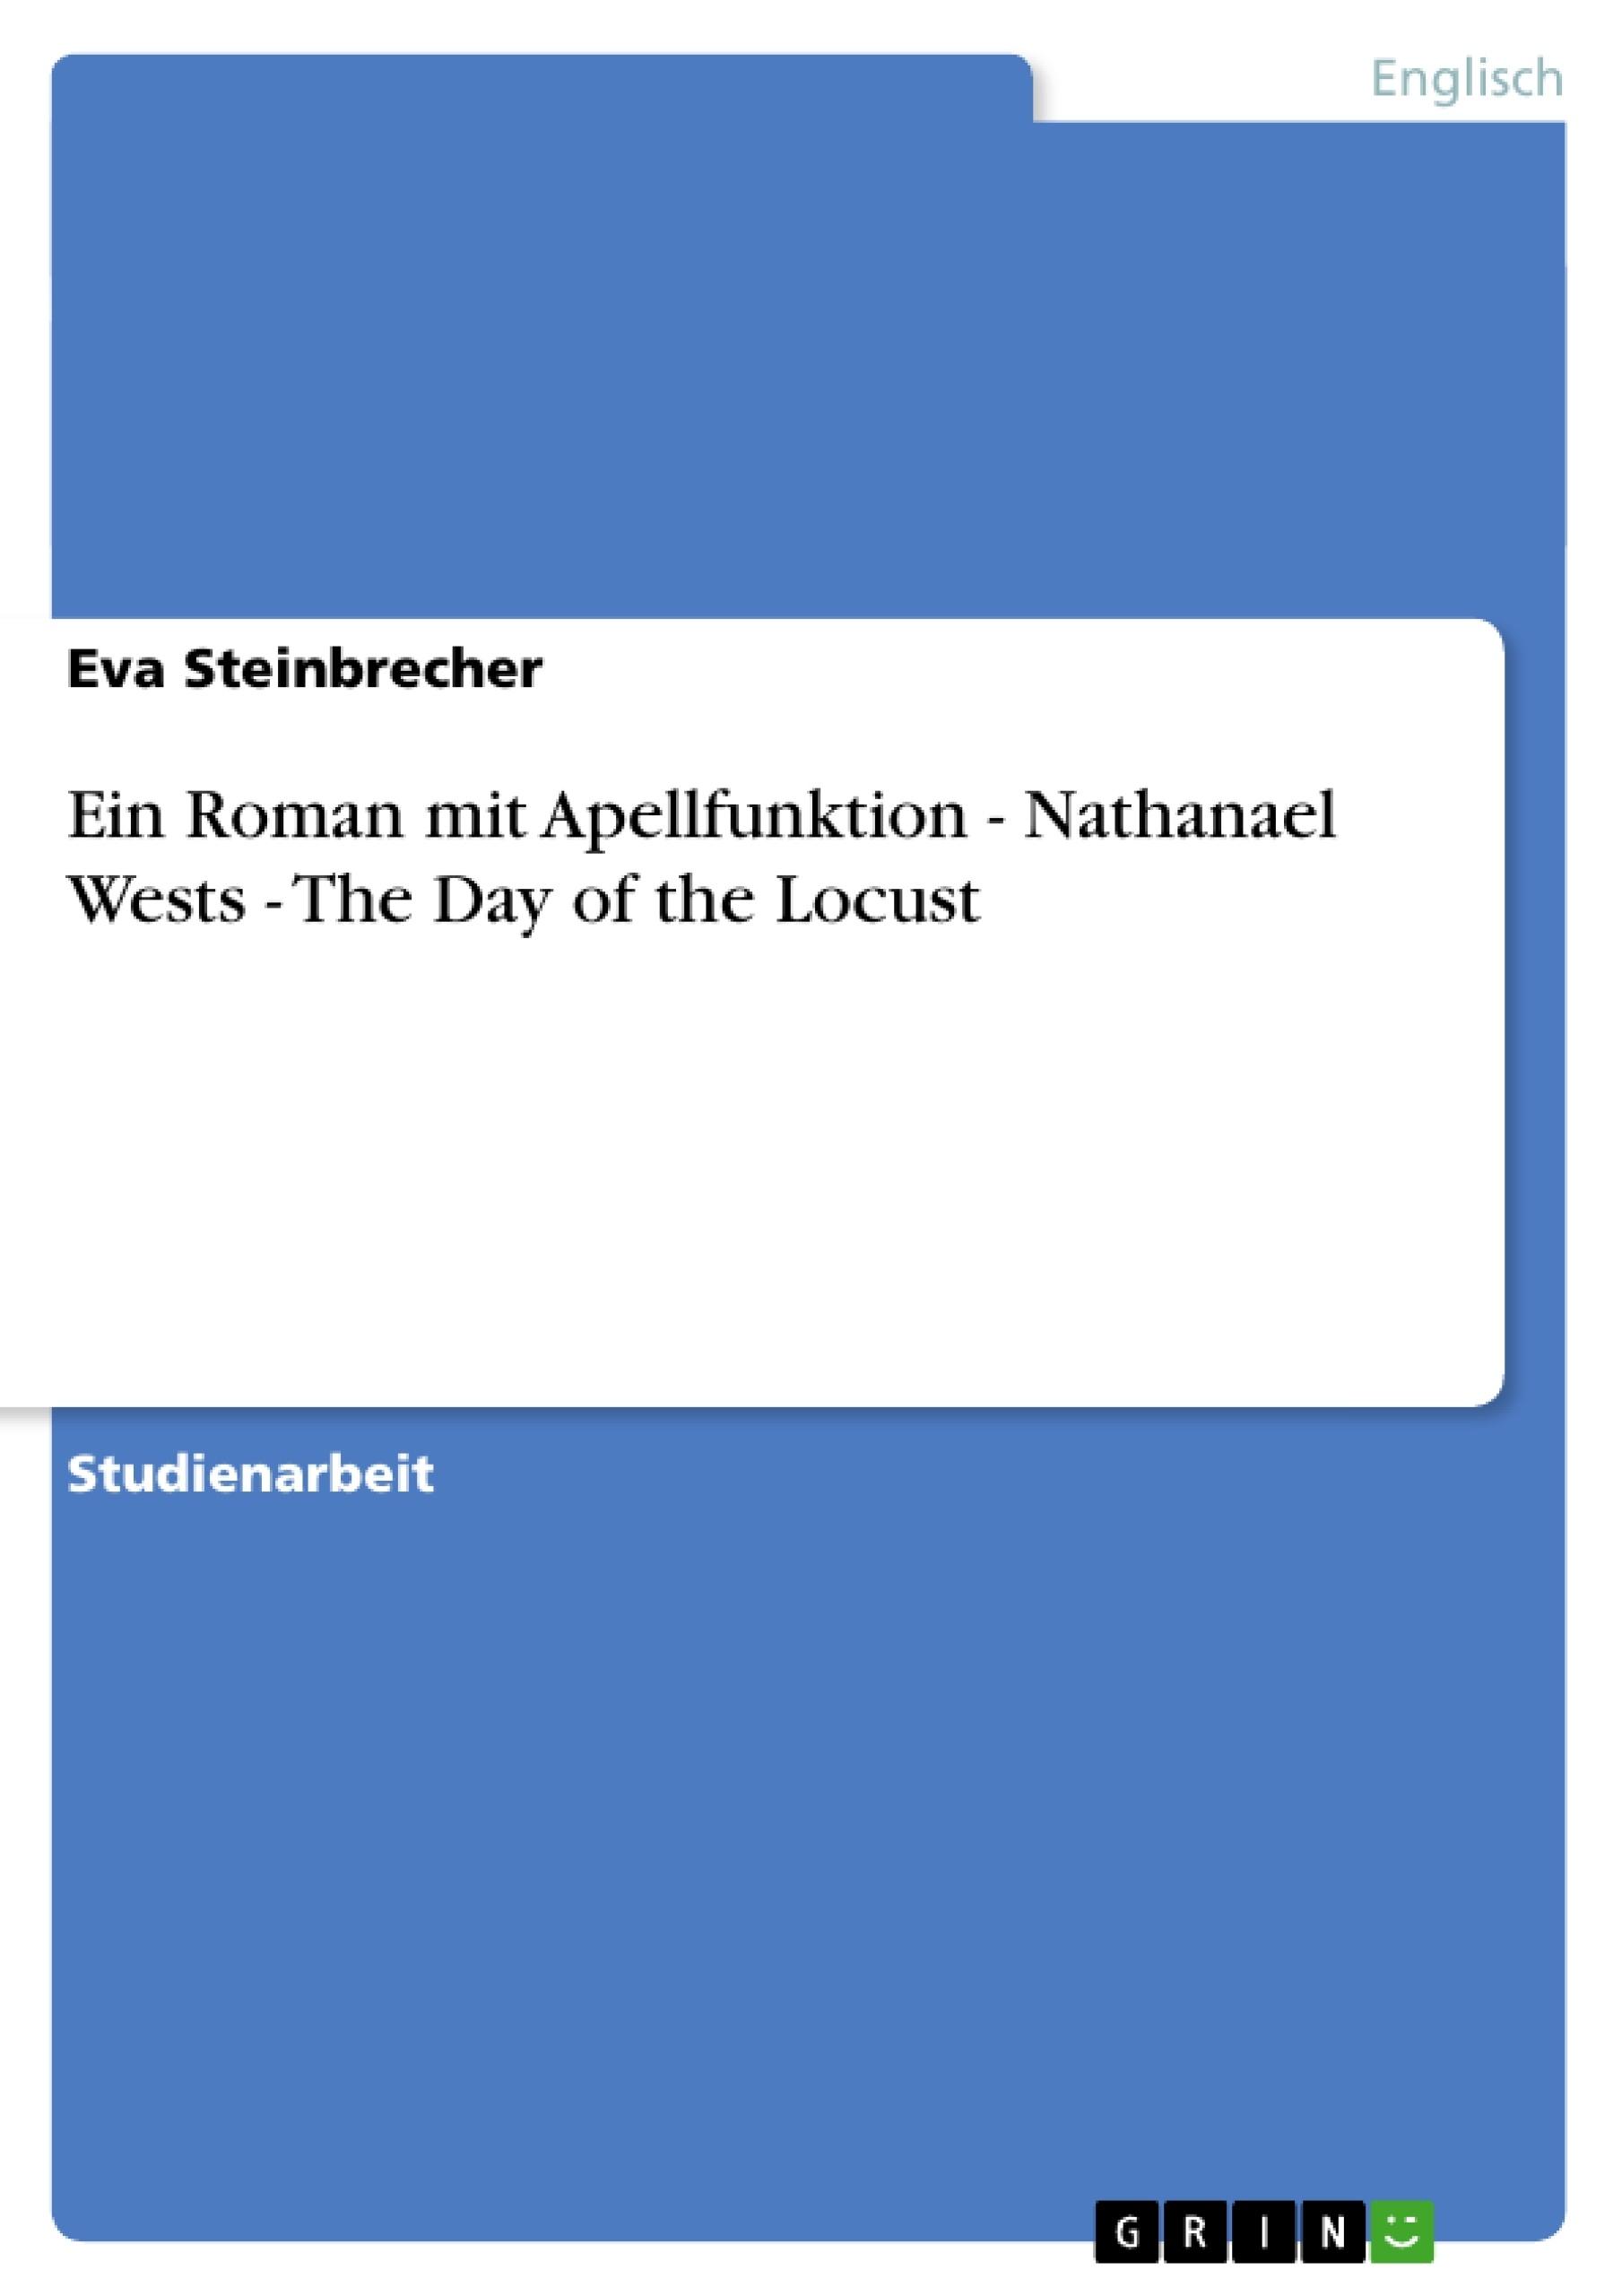 Titel: Ein Roman mit Apellfunktion - Nathanael Wests - The Day of the Locust